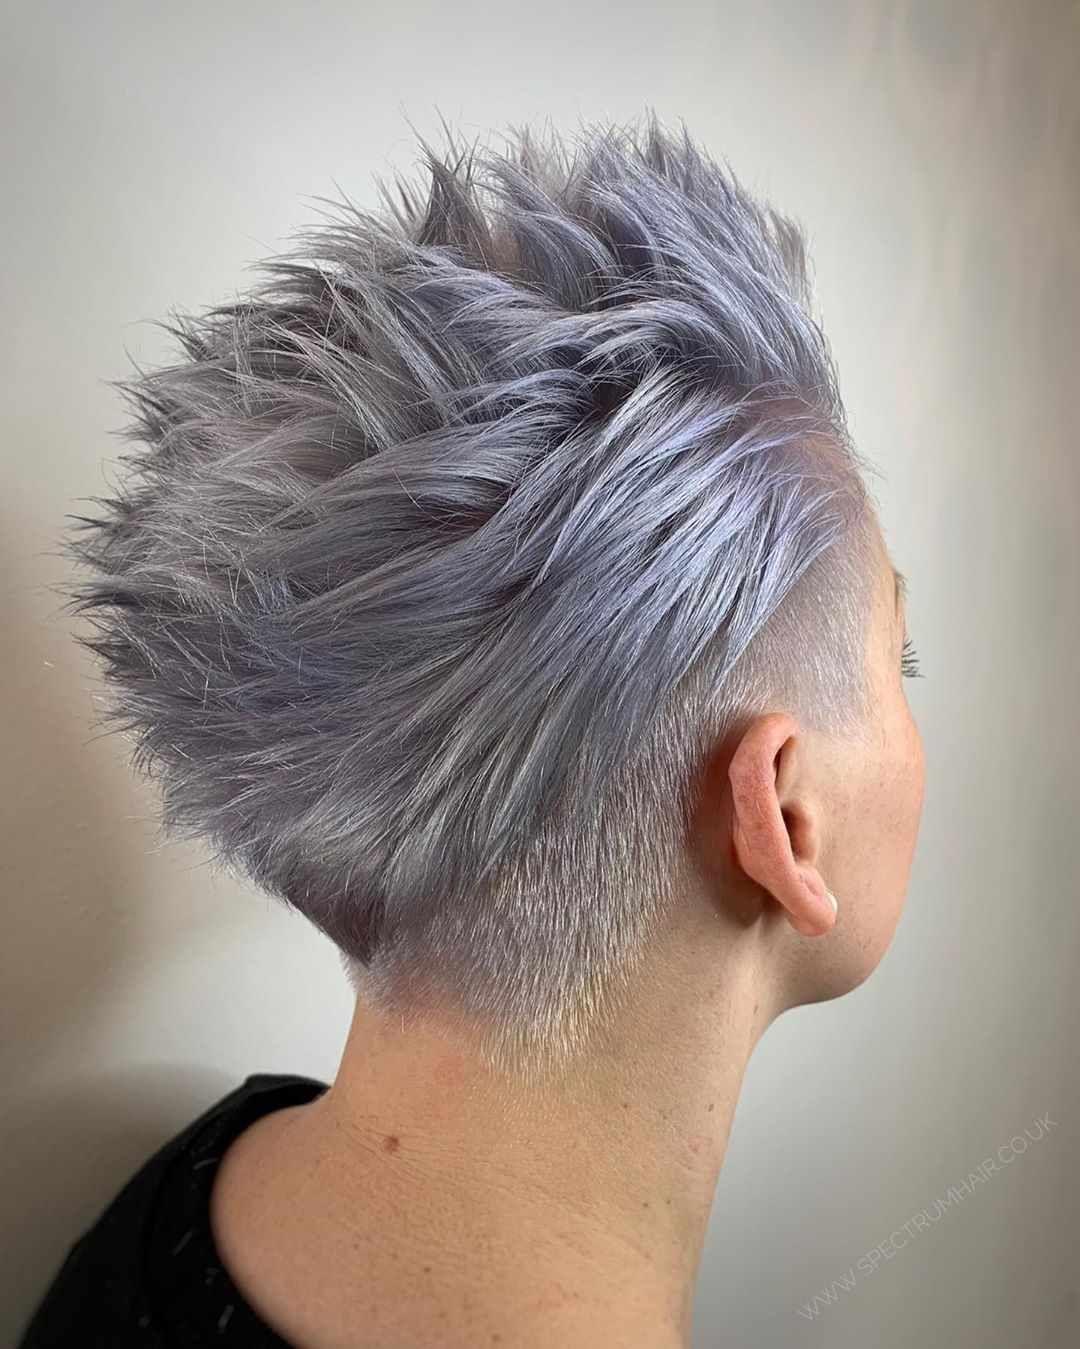 40+ Best New Pixie Haircuts For Women 2018-2019 #shortpixiehaircuts